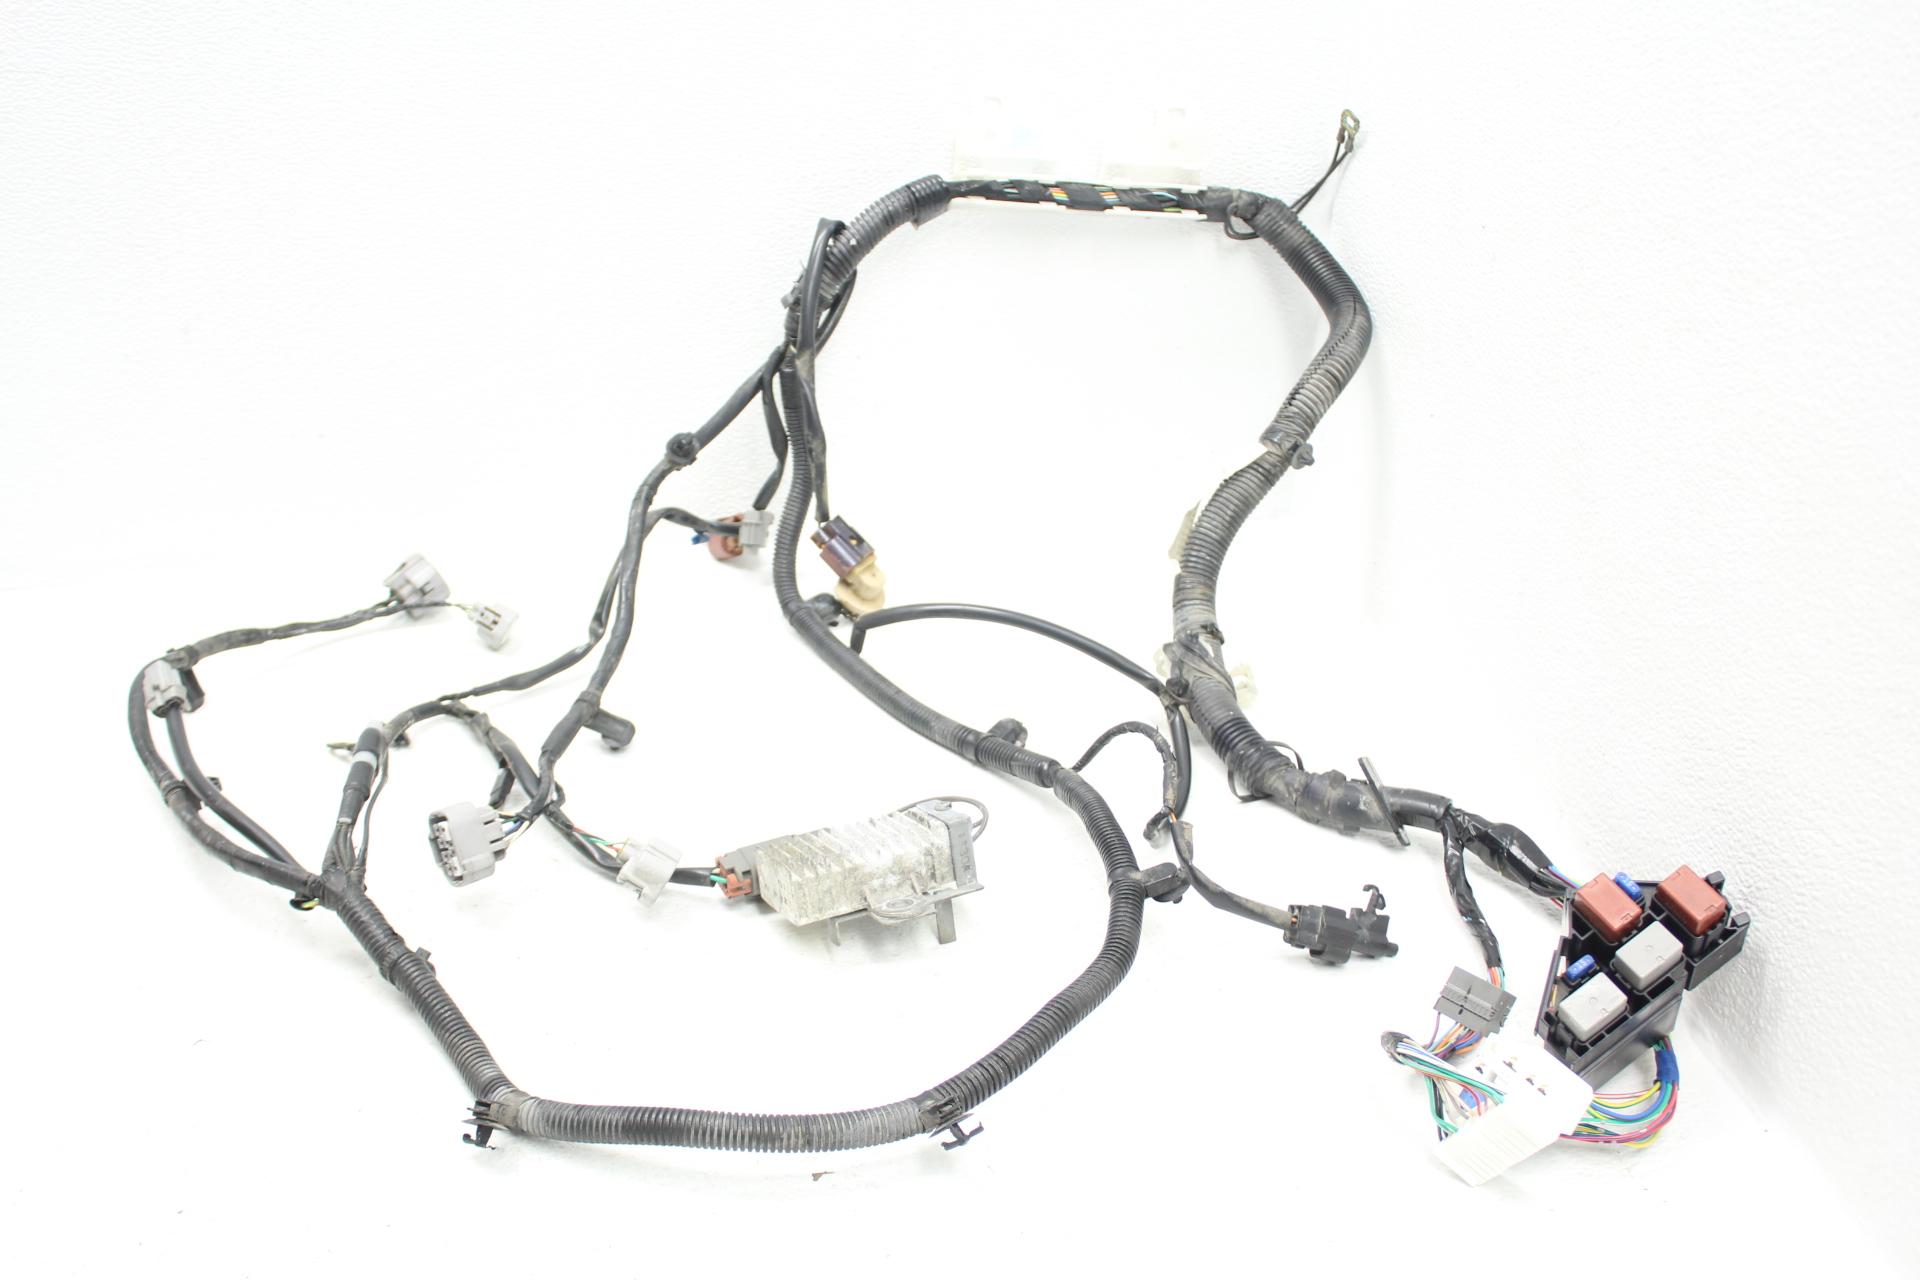 11 Subaru Wrx Amp Sti Front Chassis Wire Wiring Harness